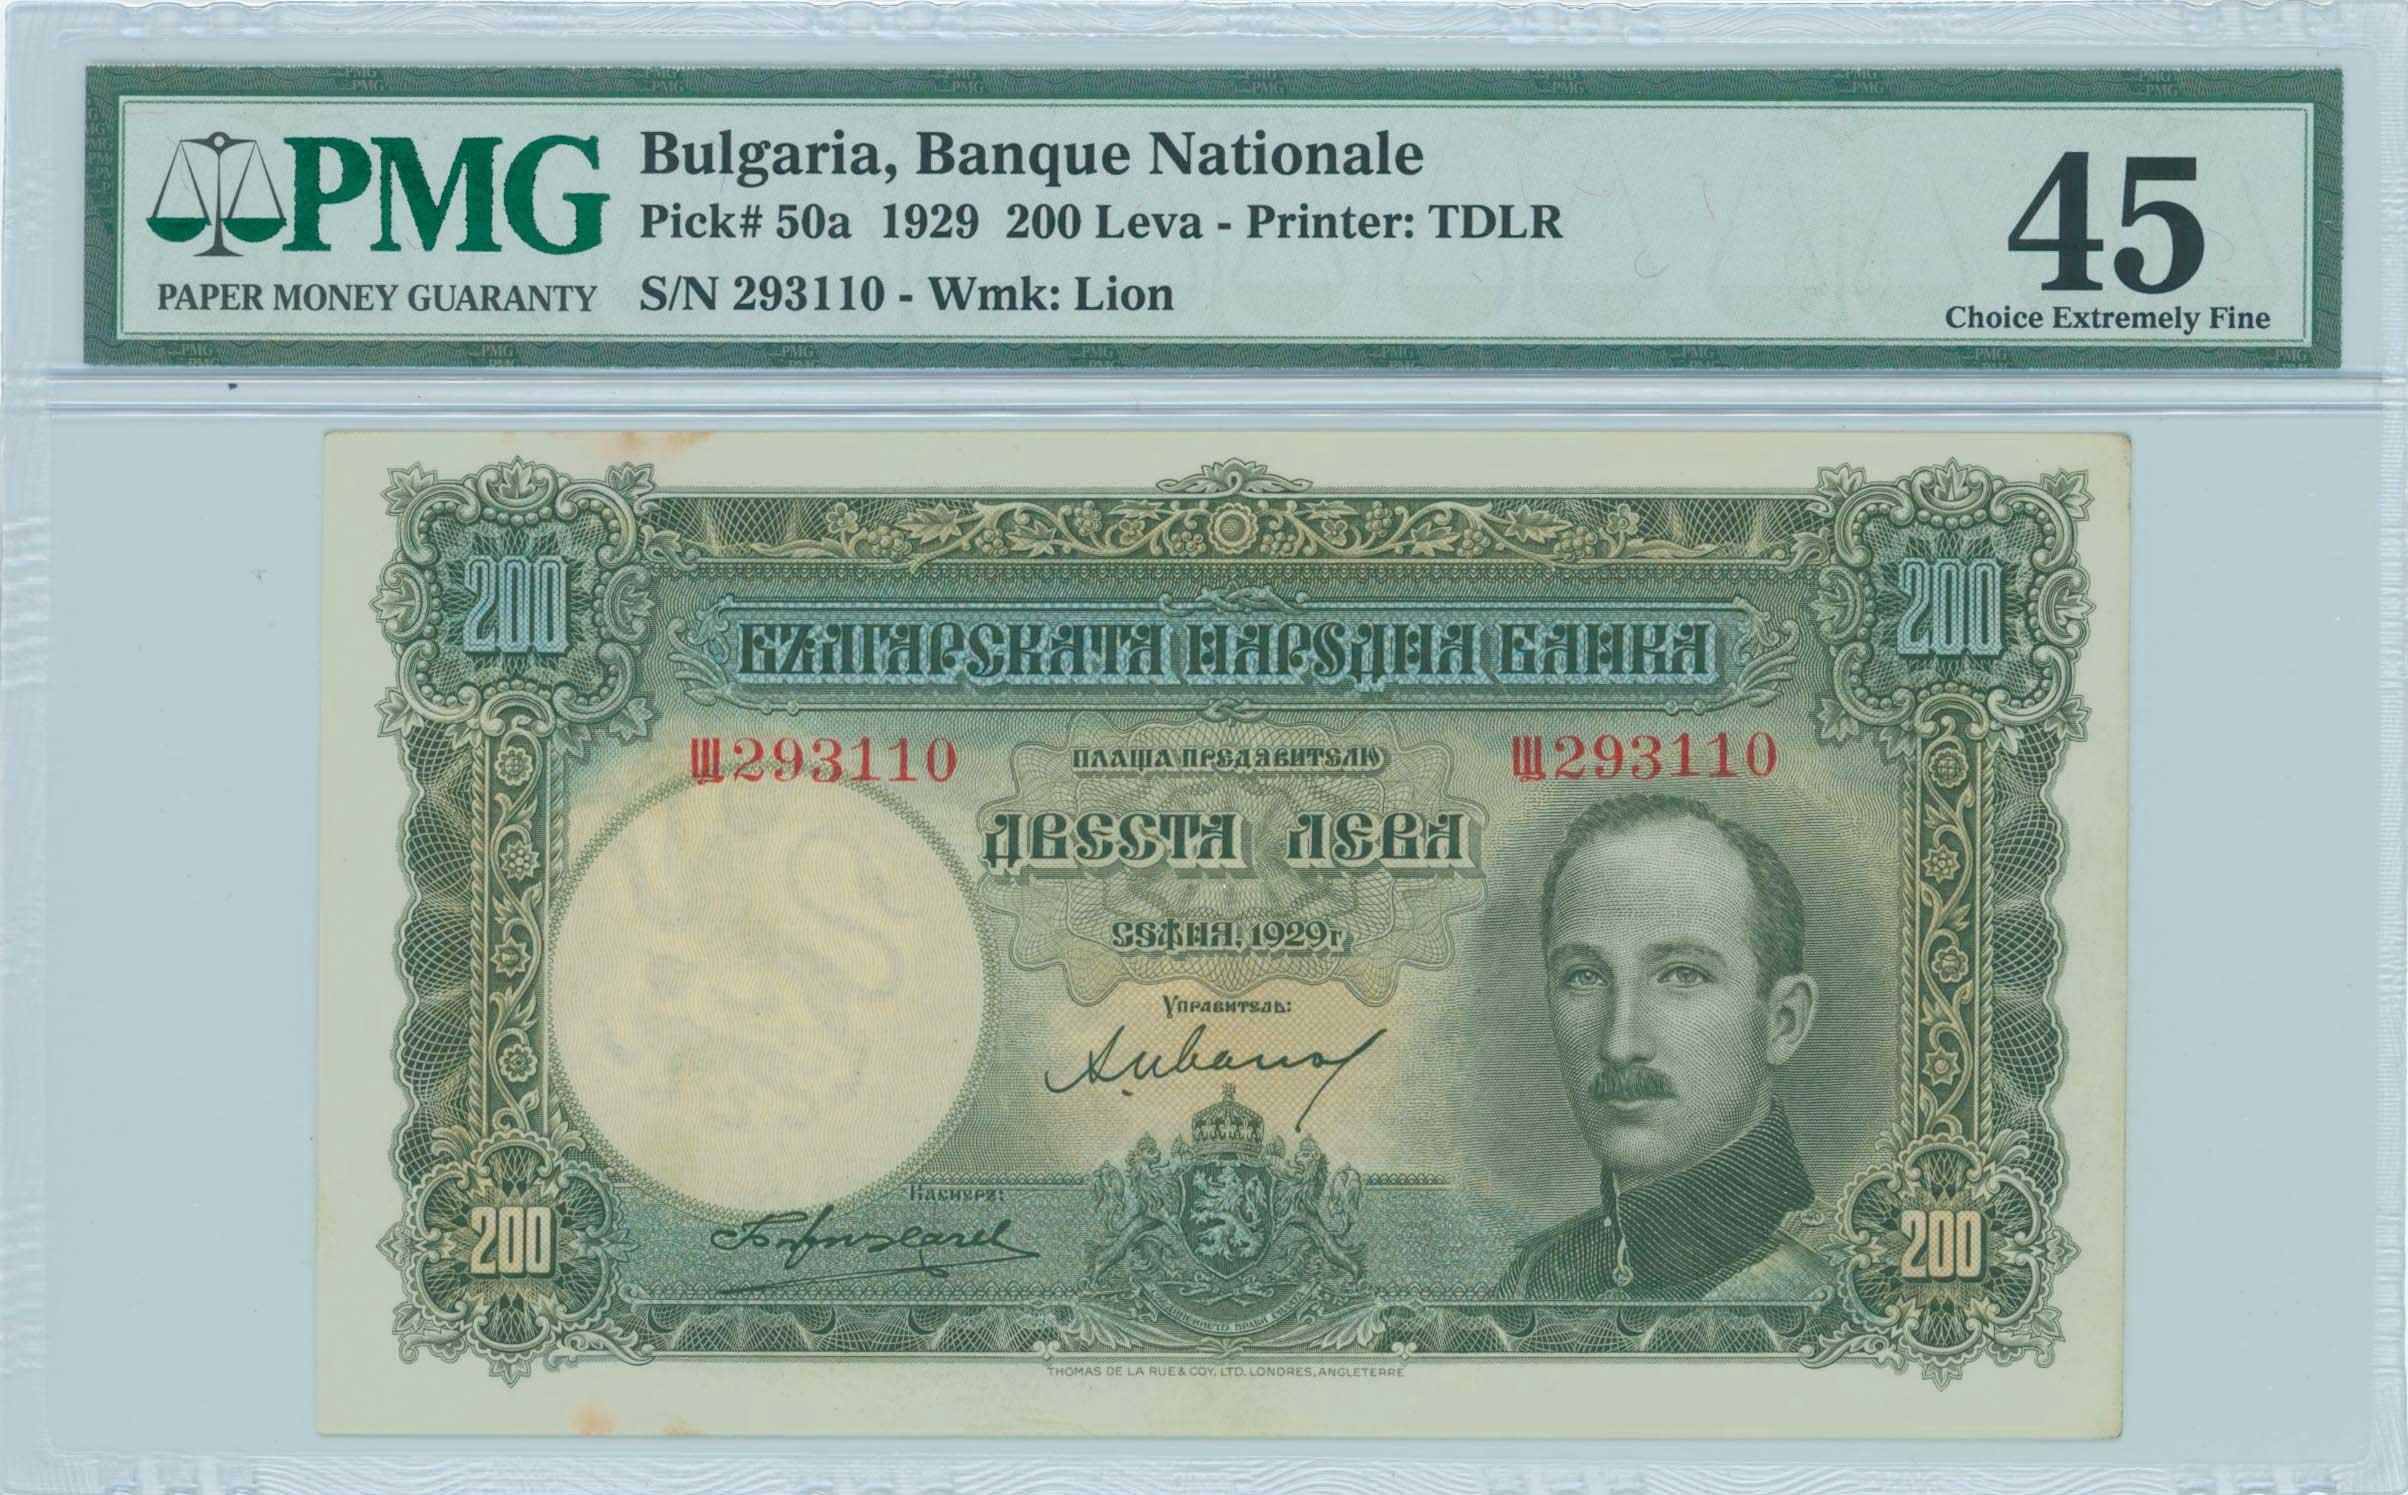 Lot 6710 - -  PAPER MONEY - BANKNOTES BULGARIAN OCCUPATION -  A. Karamitsos Postal & Live Internet Auction 984  (Part A)